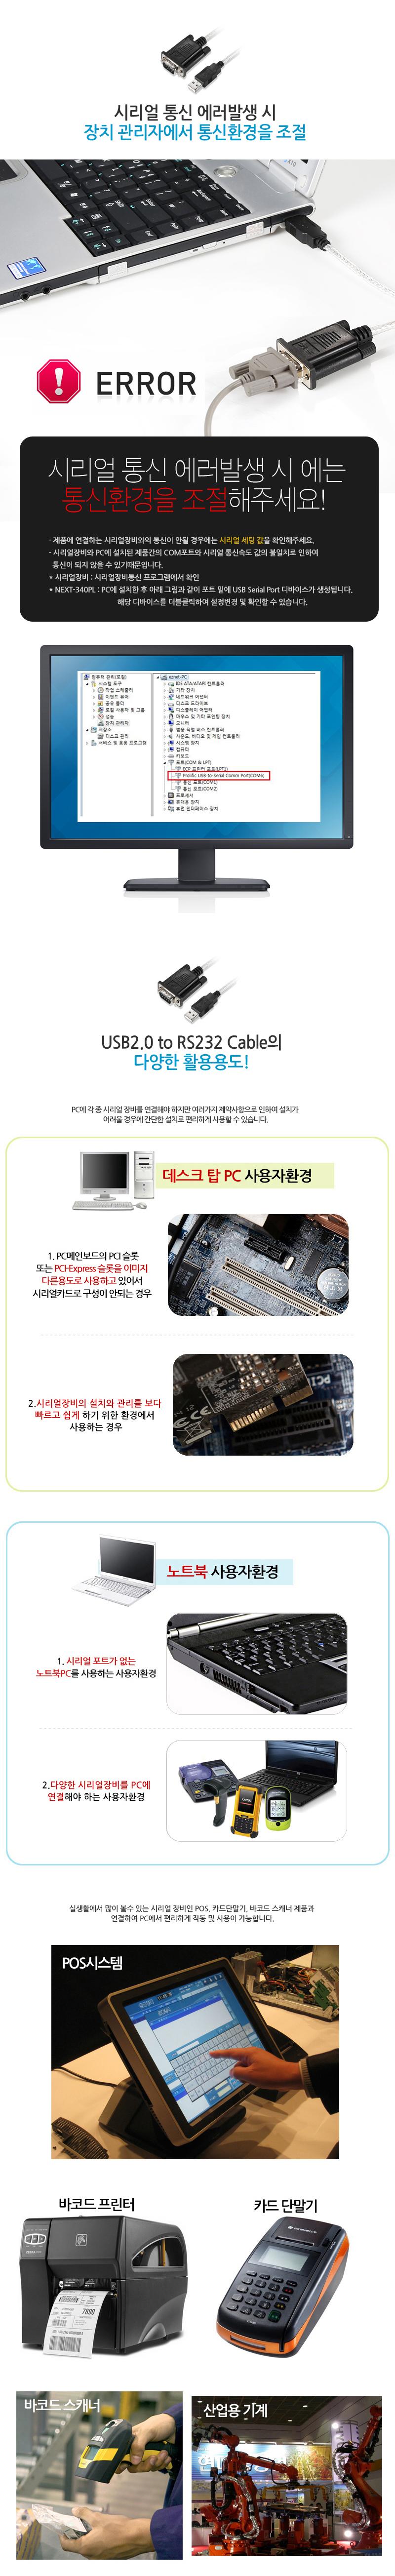 NEXT-340PL_3_160328.jpg